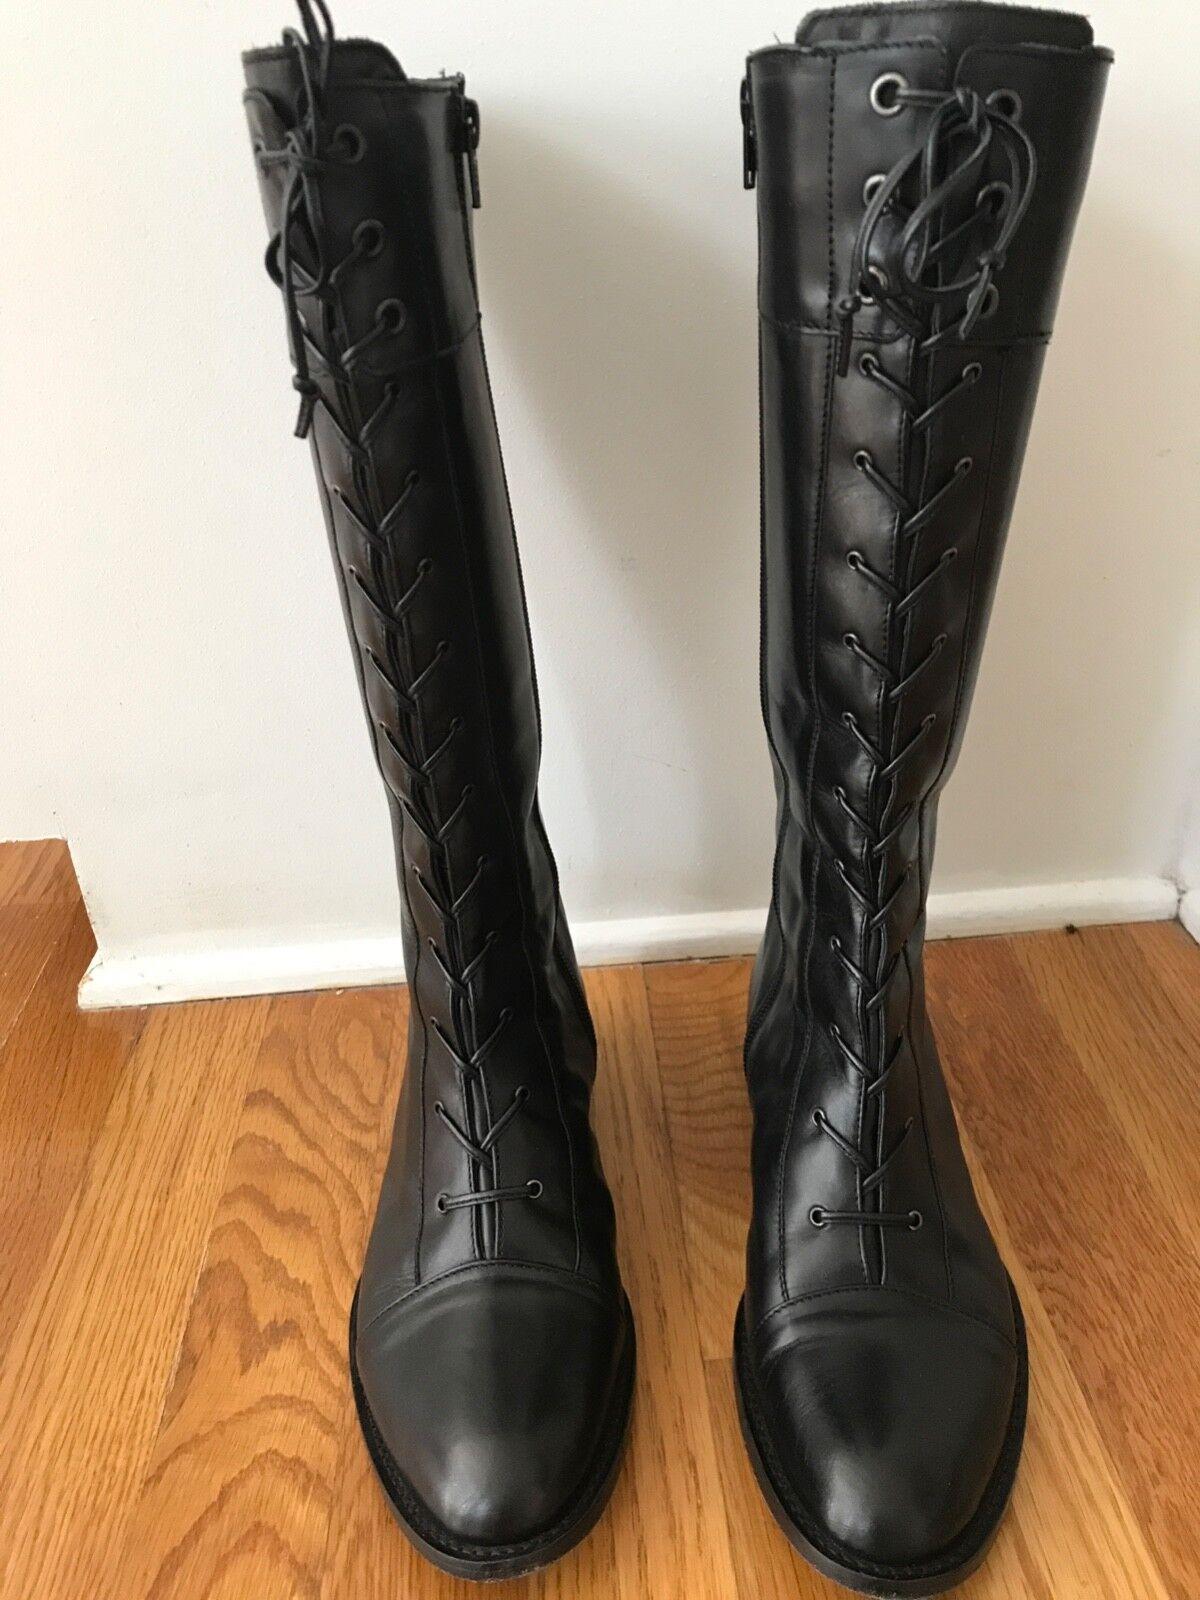 Via Spiga Spiga Spiga  Reverie Black Carez  Black Boots Size 6.5 63f1fc